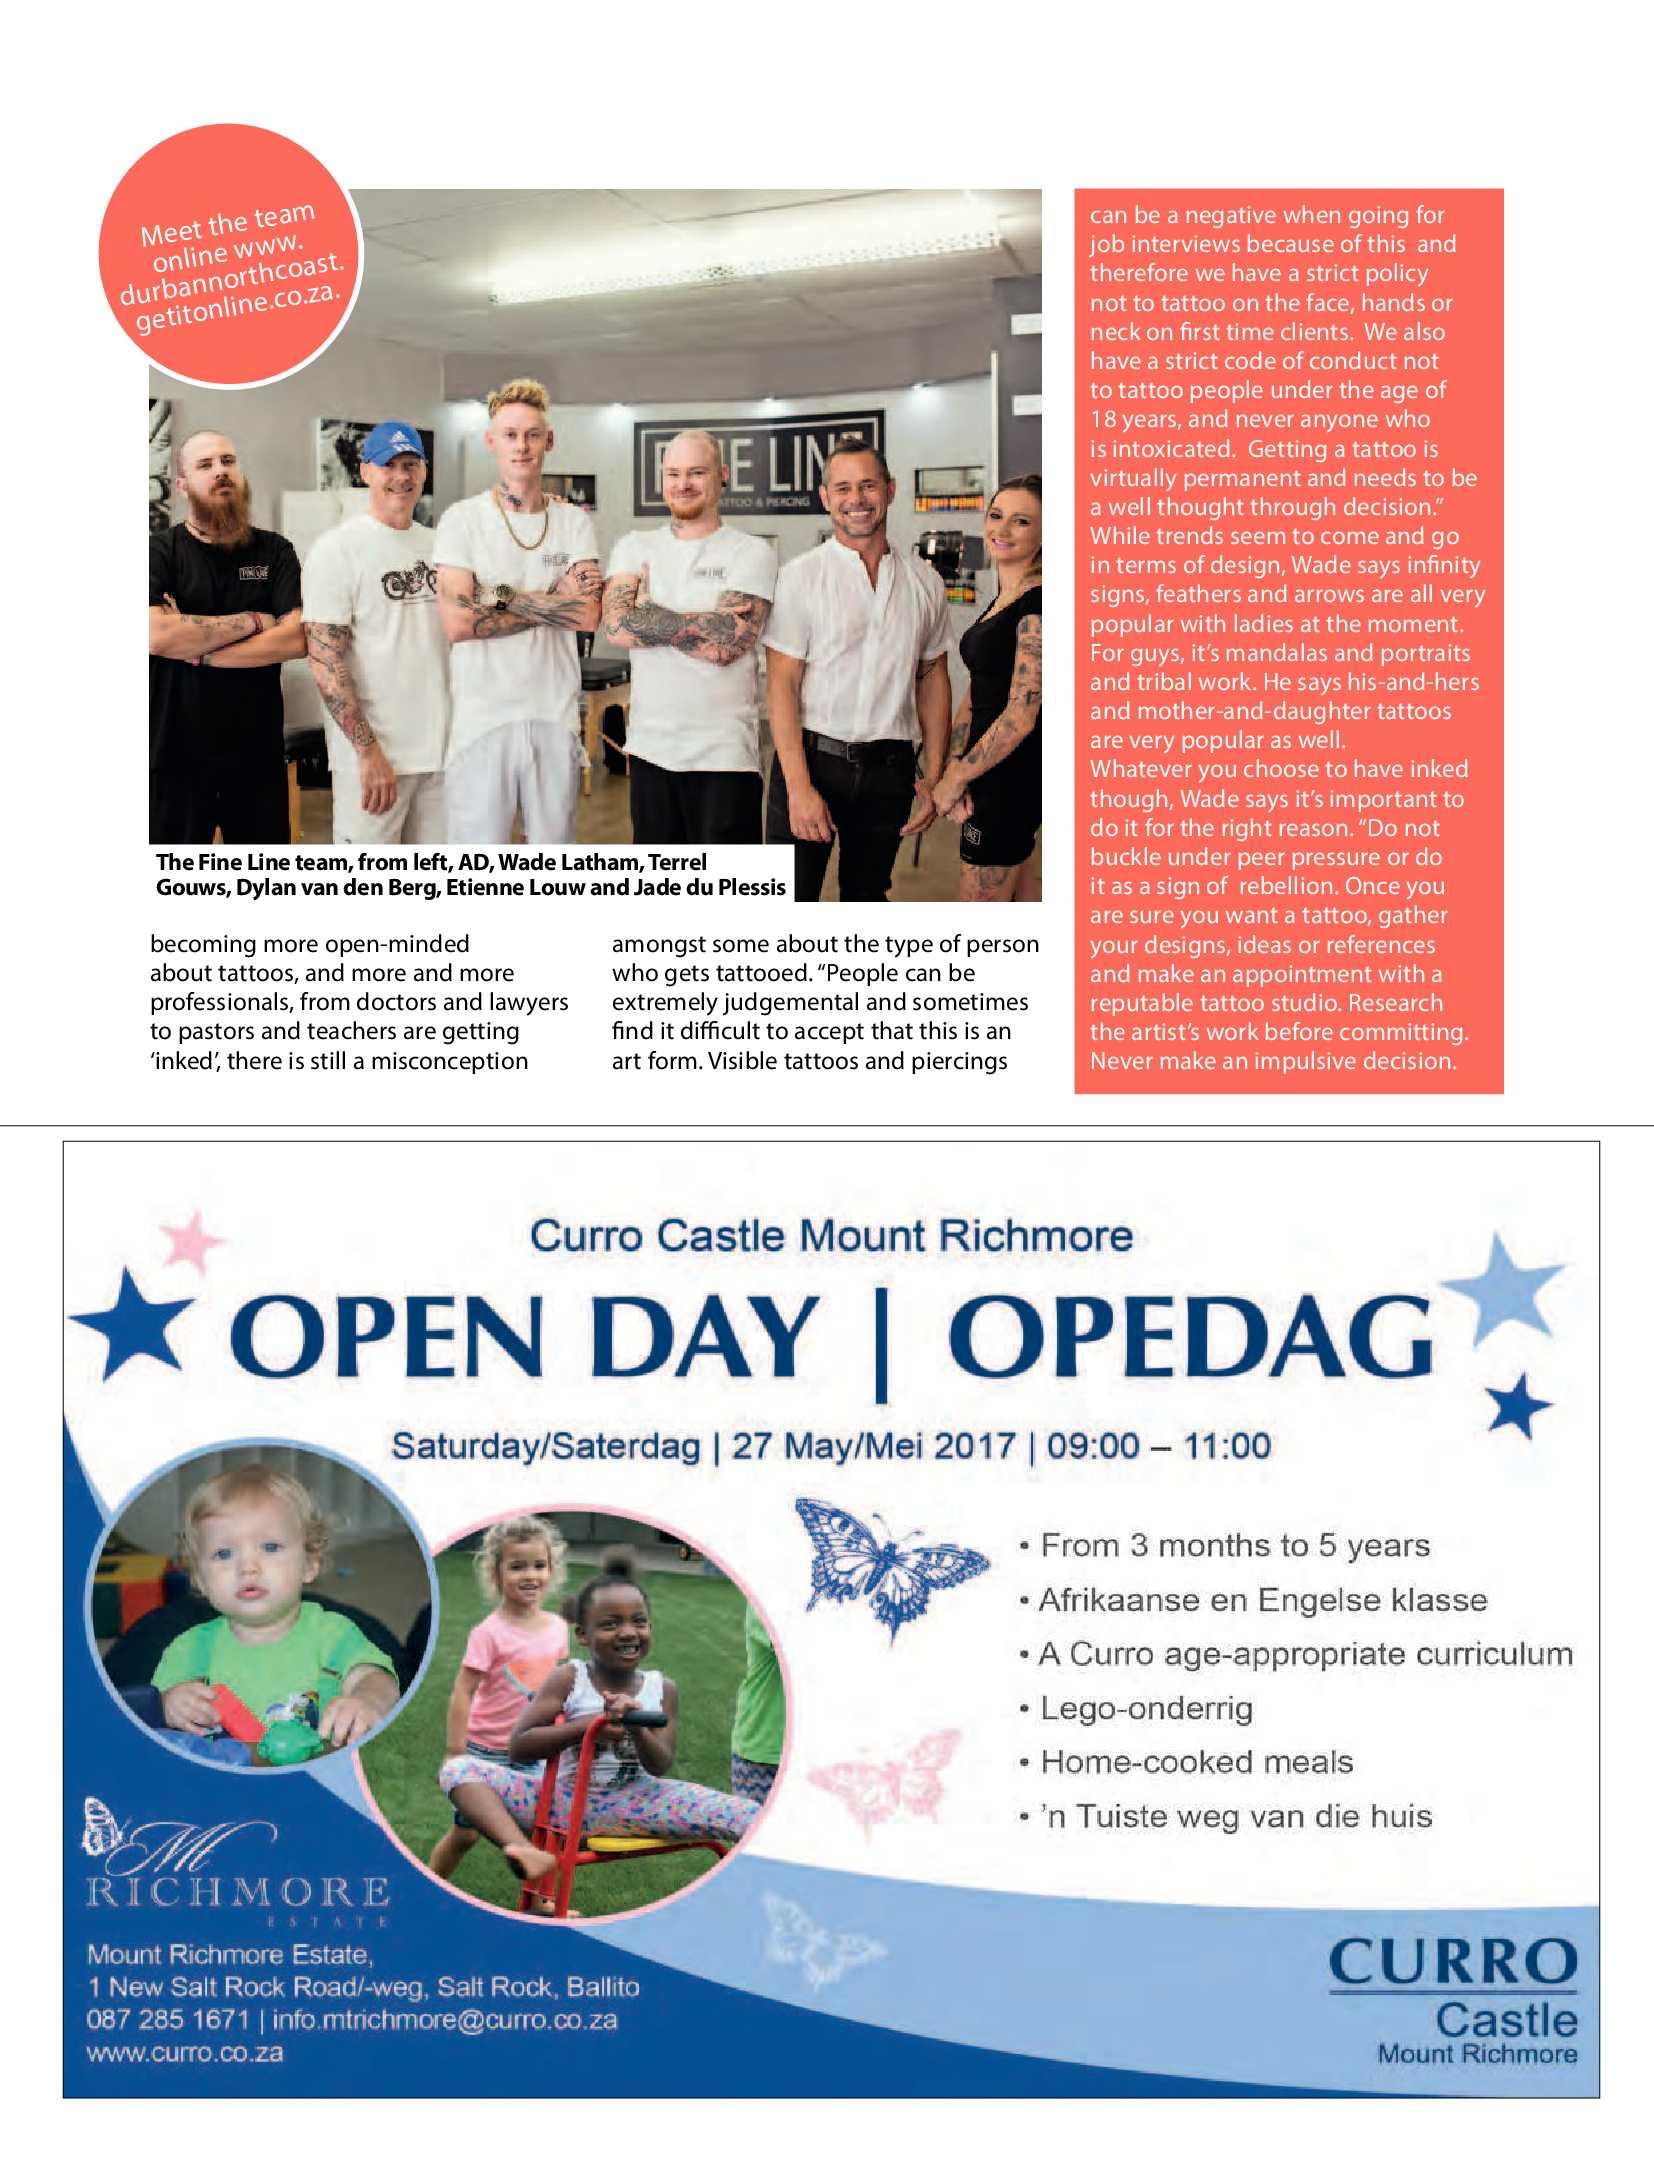 get-magazine-ballitoumhlanga-may-2017-epapers-page-23